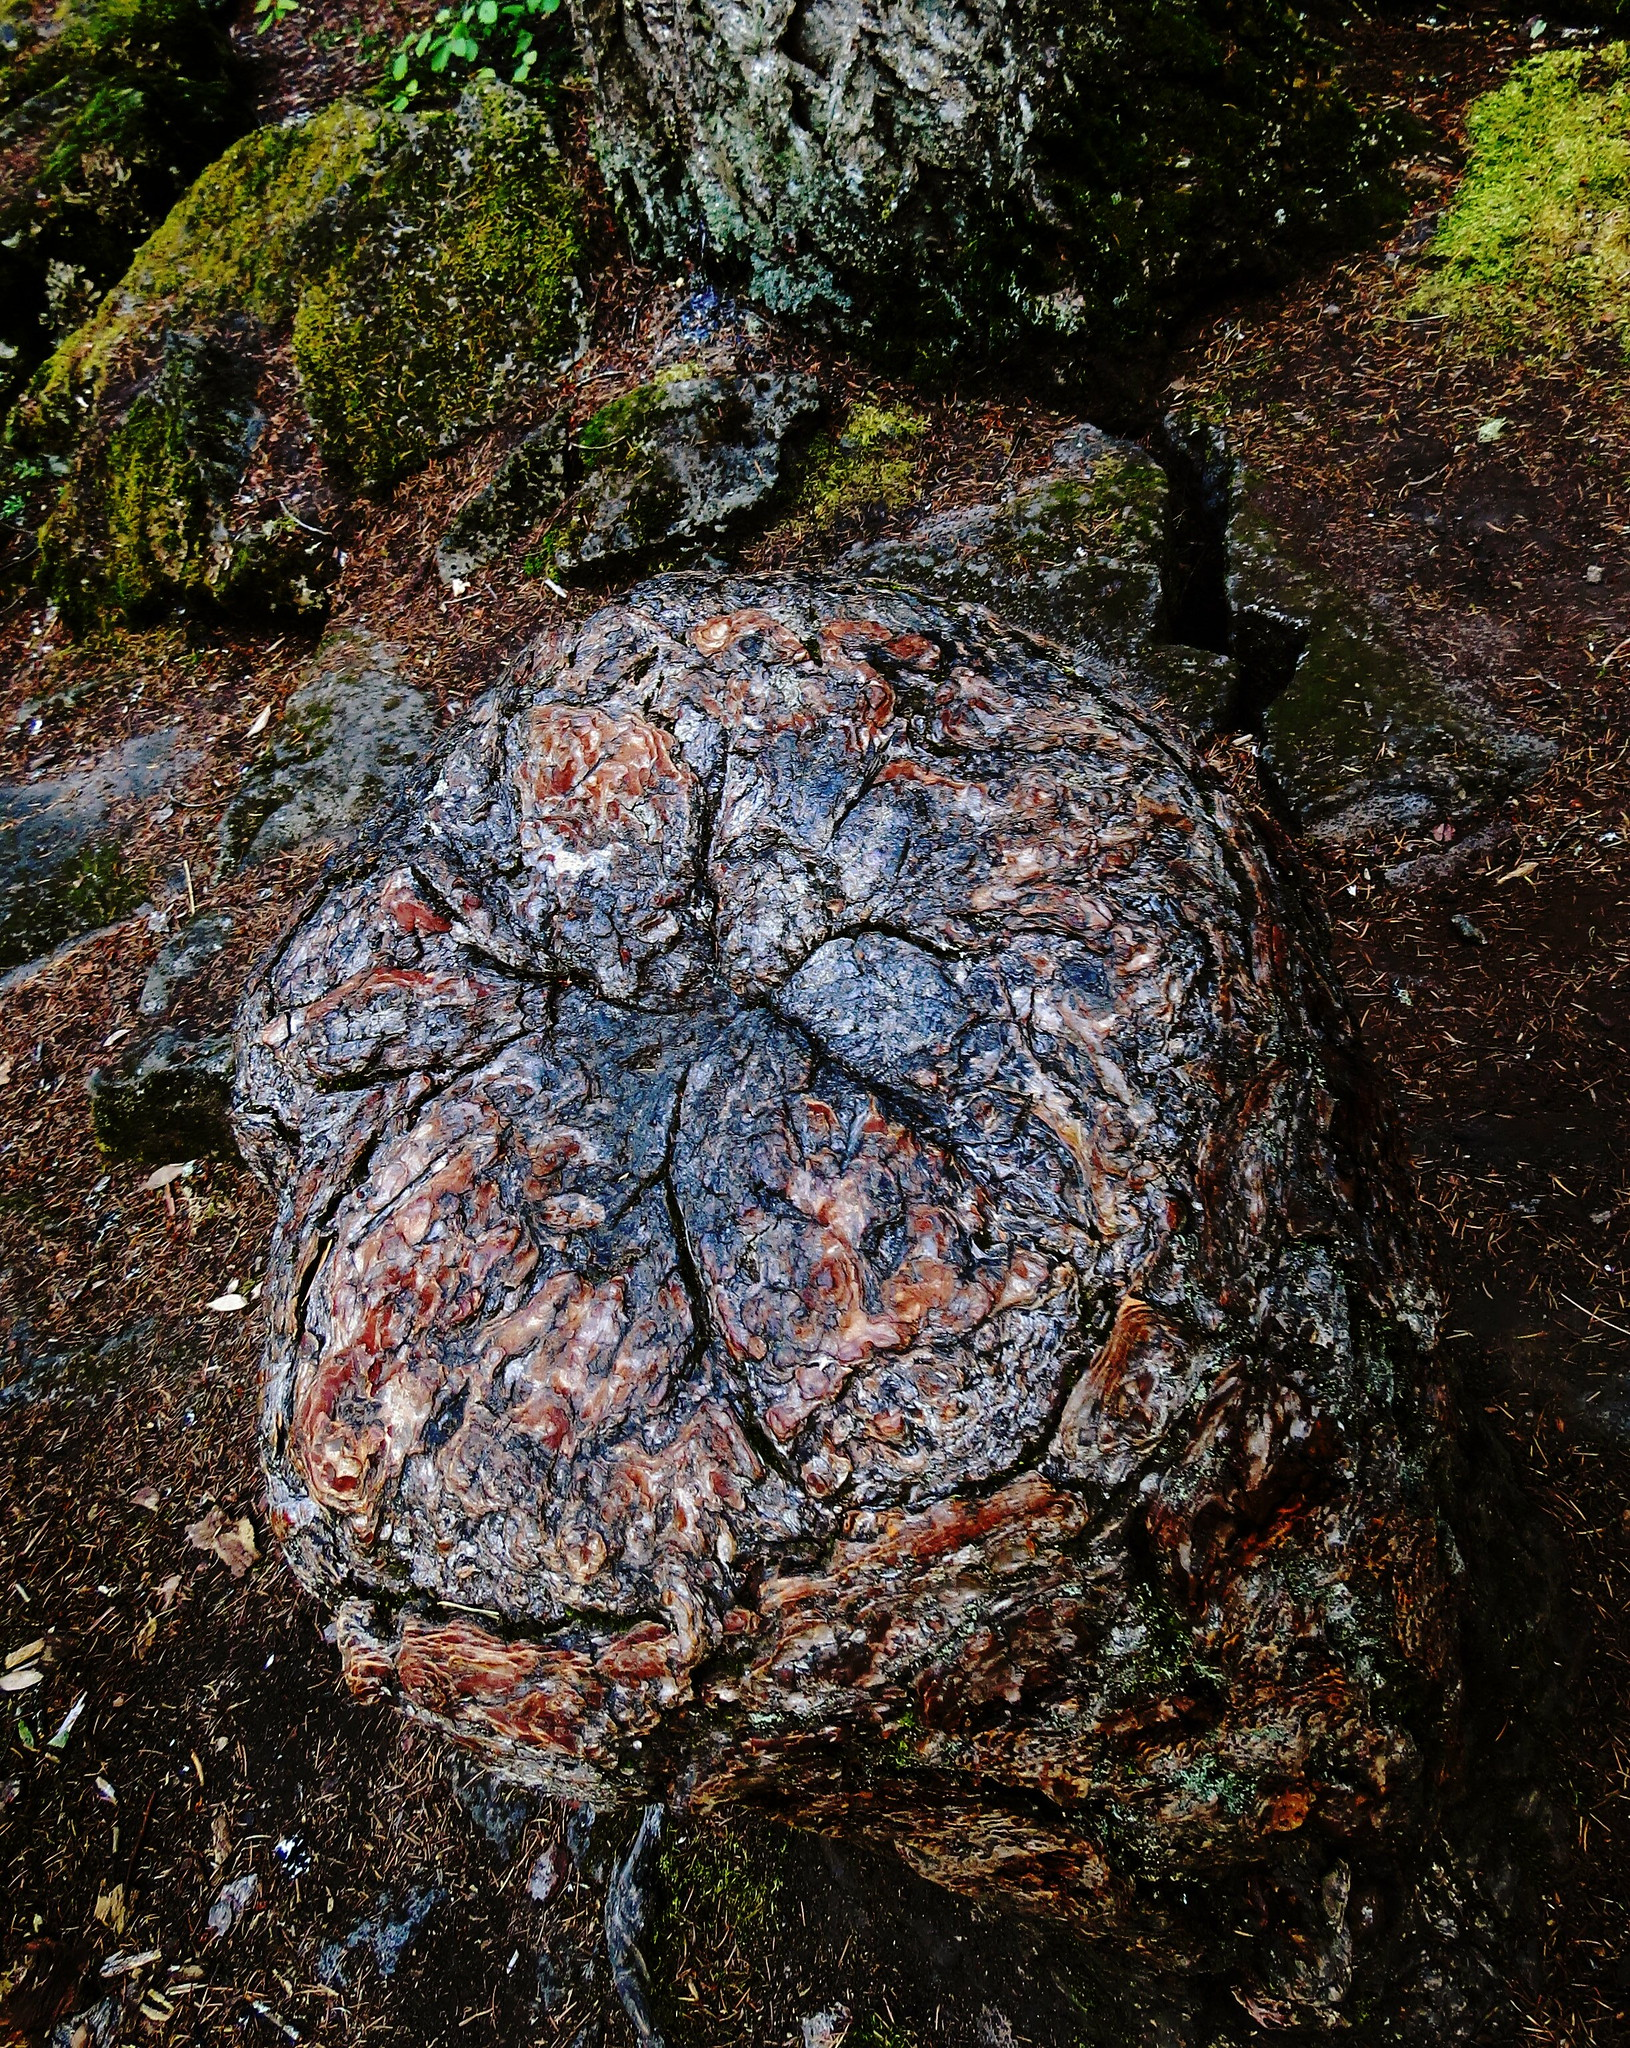 The Living Stump of Douglas-firs, Rogue Gorge, Oregon